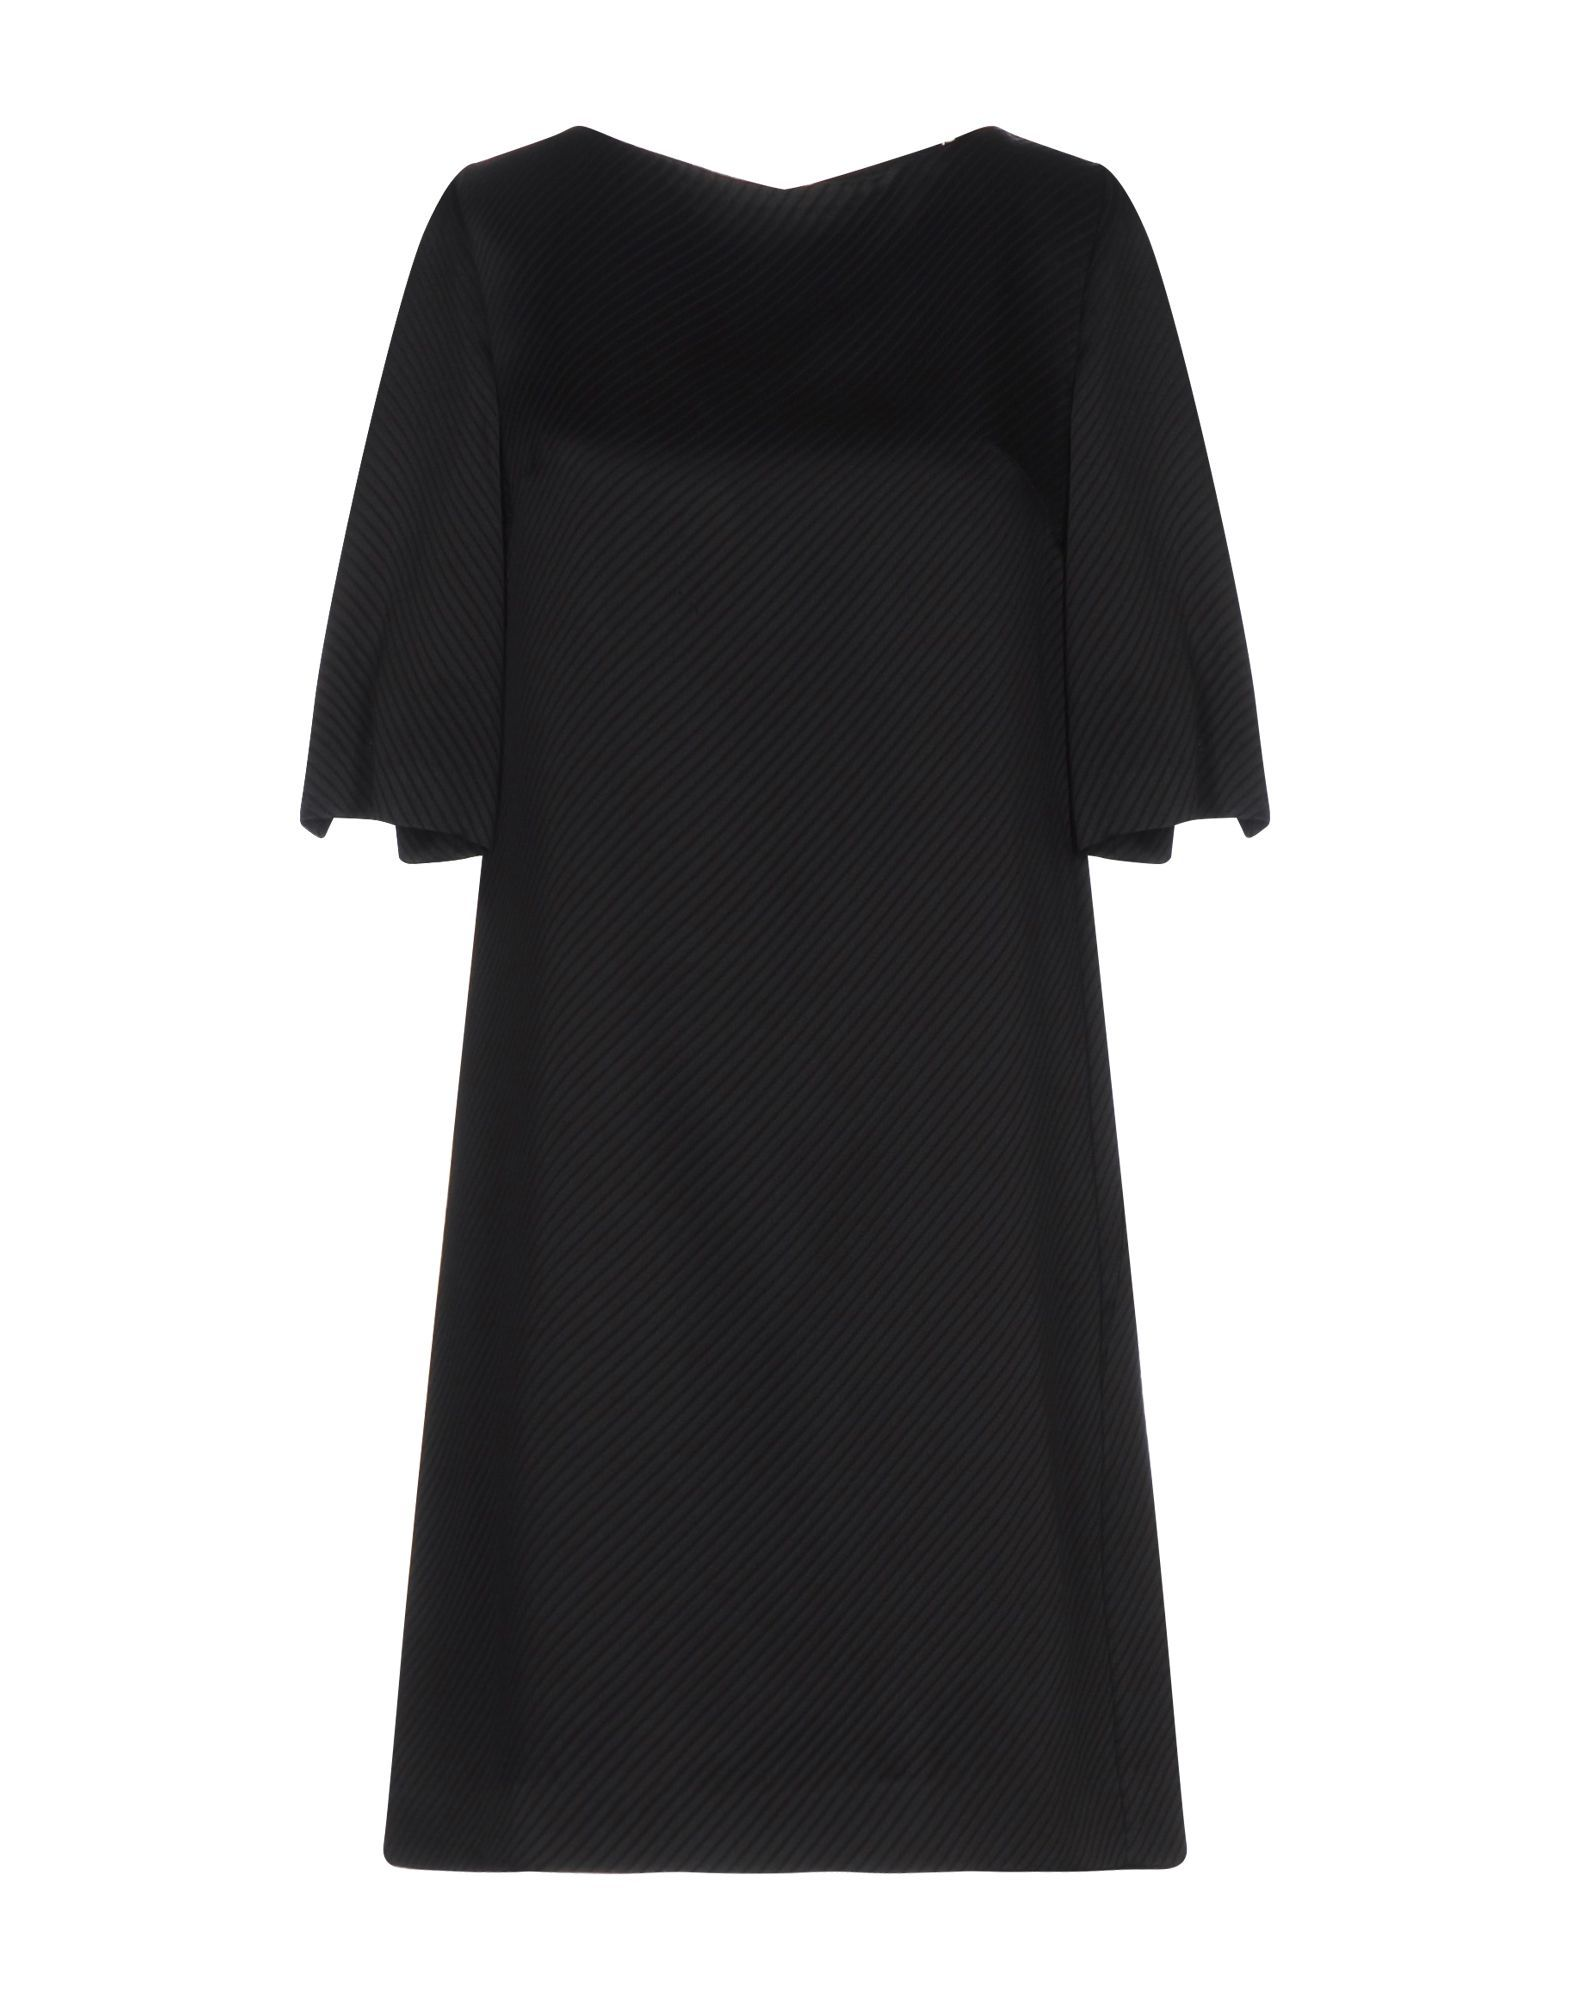 Byblos Black Short Sleeve Dress